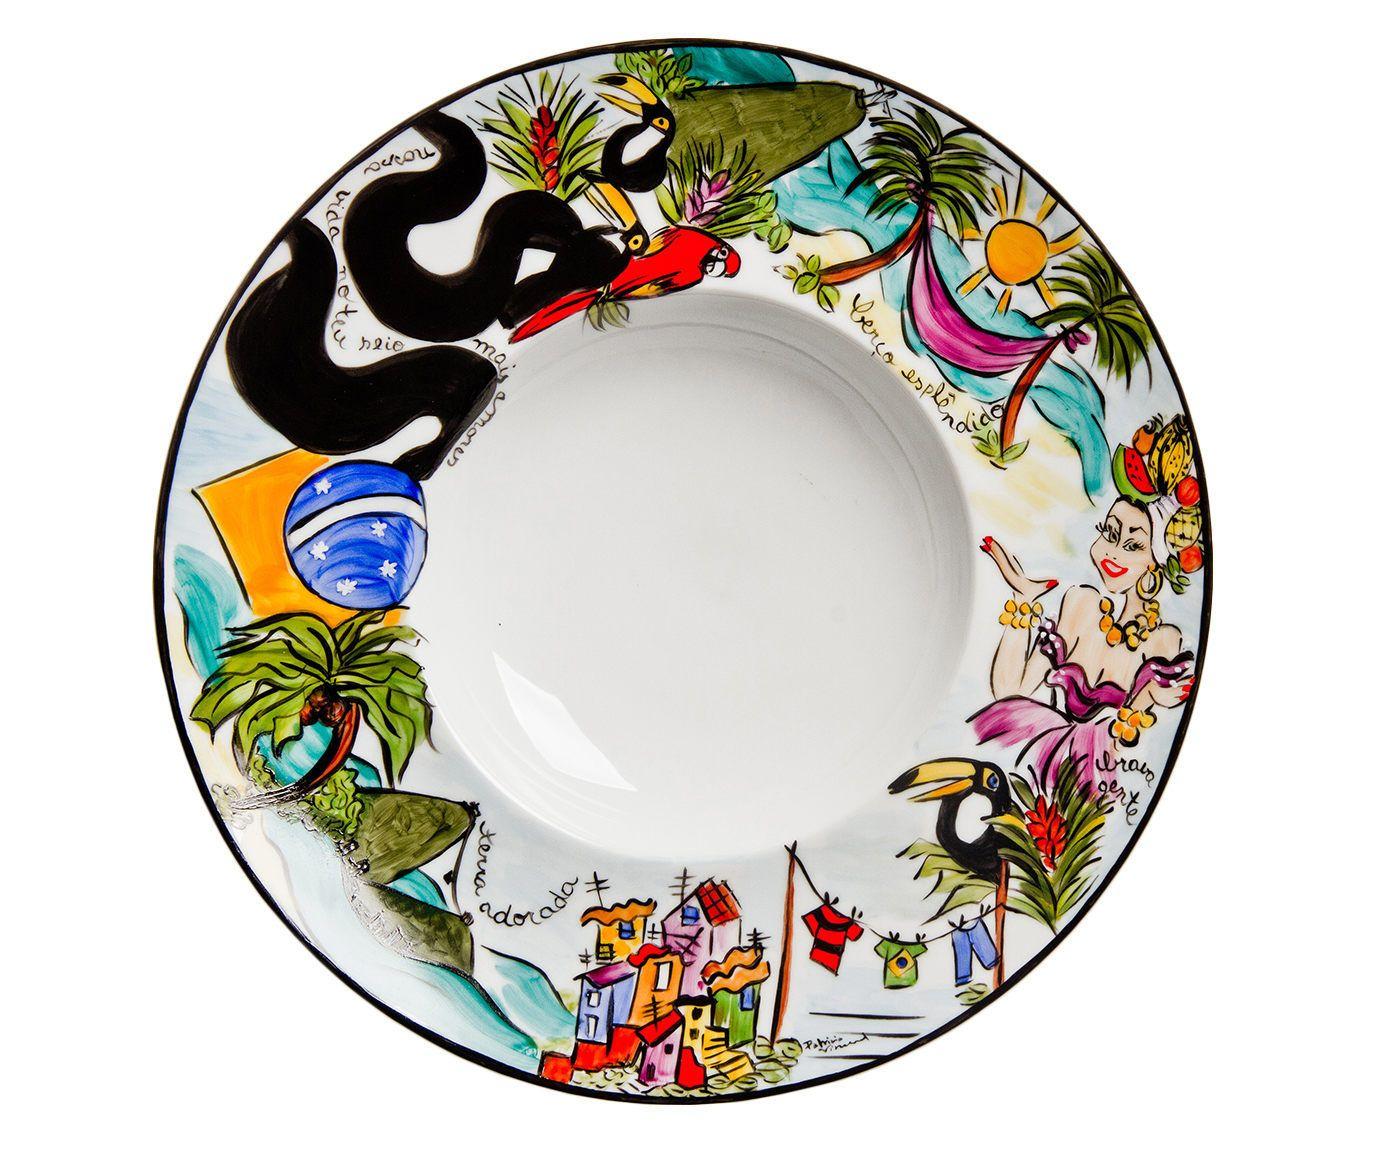 Prato gourmet carmen brasileirinho - patricia virmond | Westwing.com.br